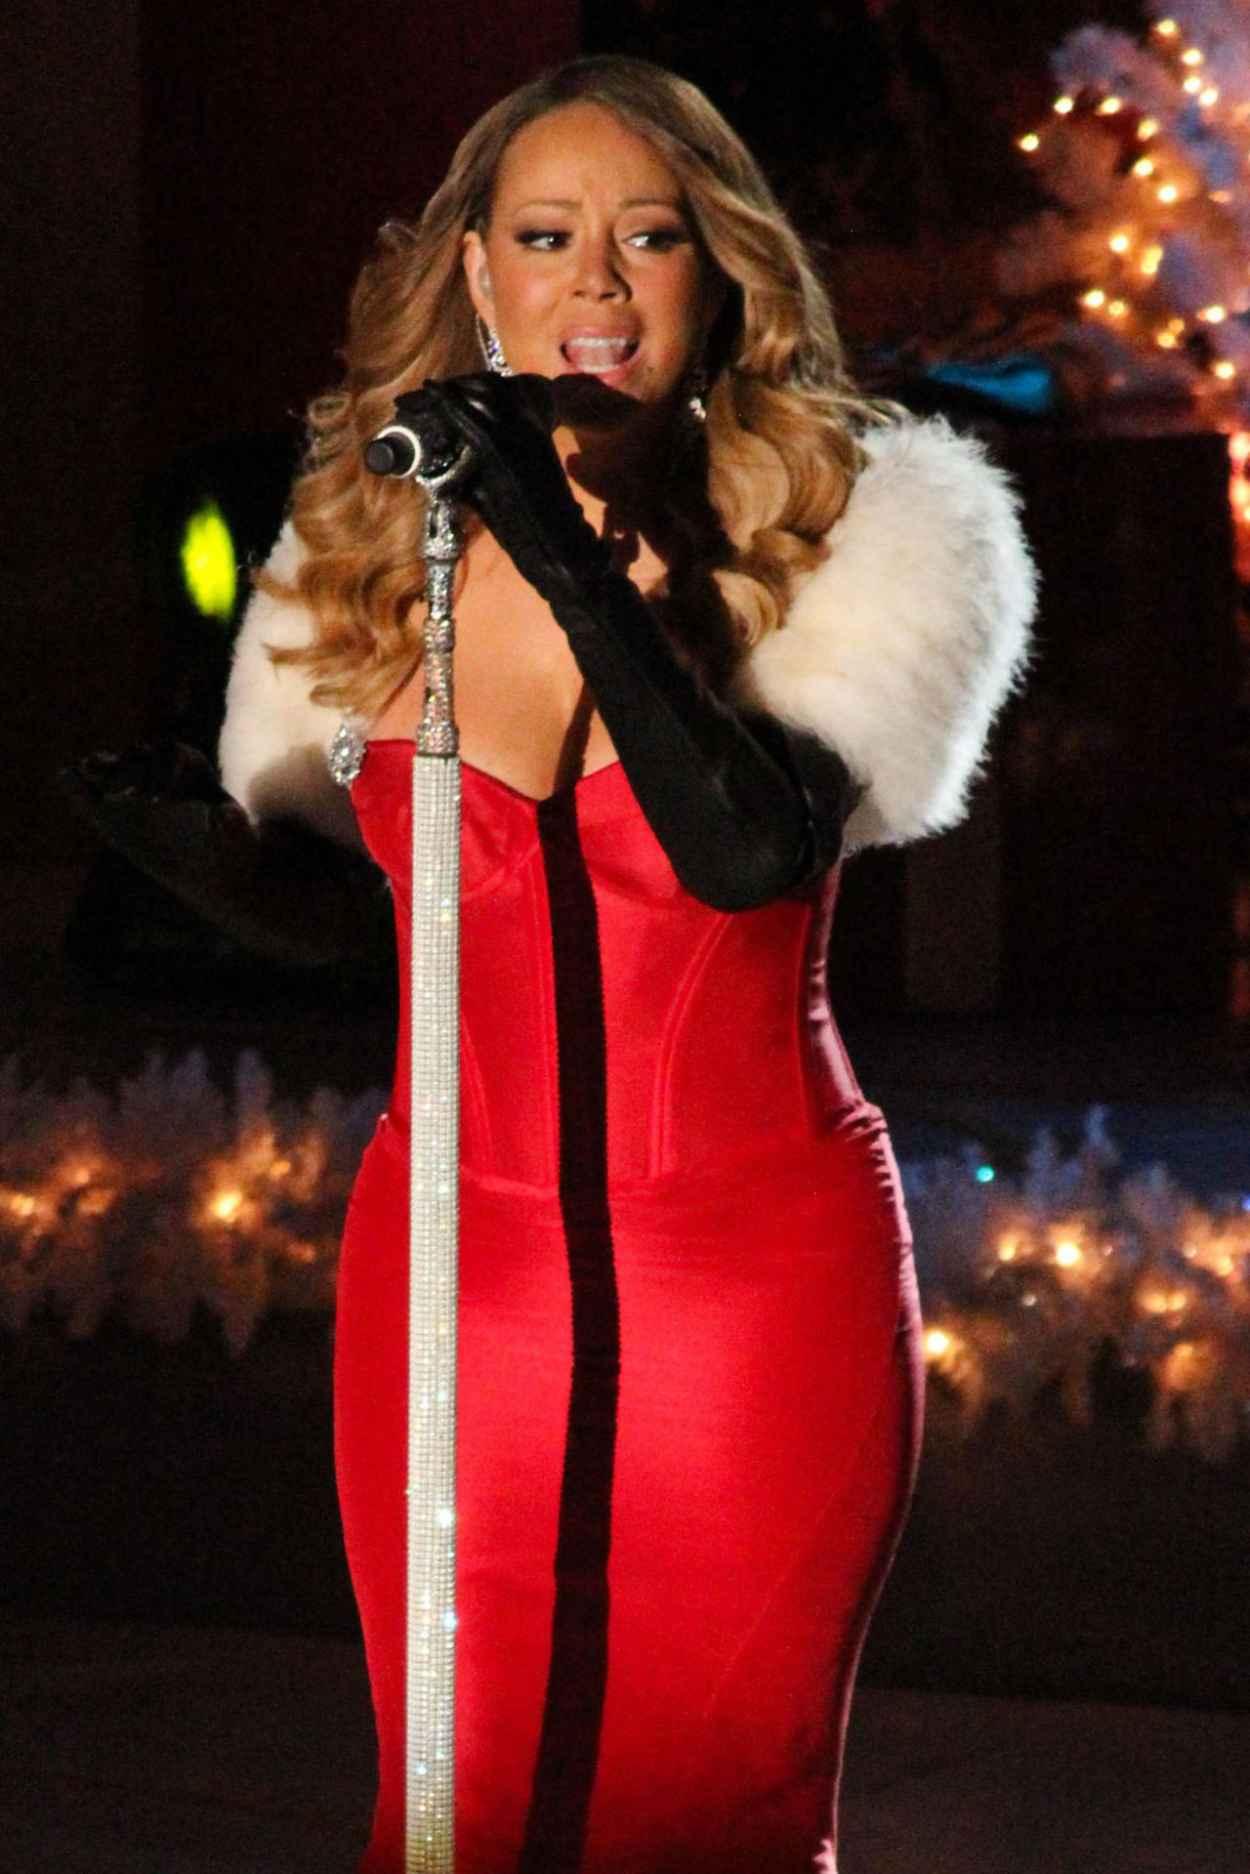 Mariah Carey Performs at 81st Annual Rockefeller Center ...